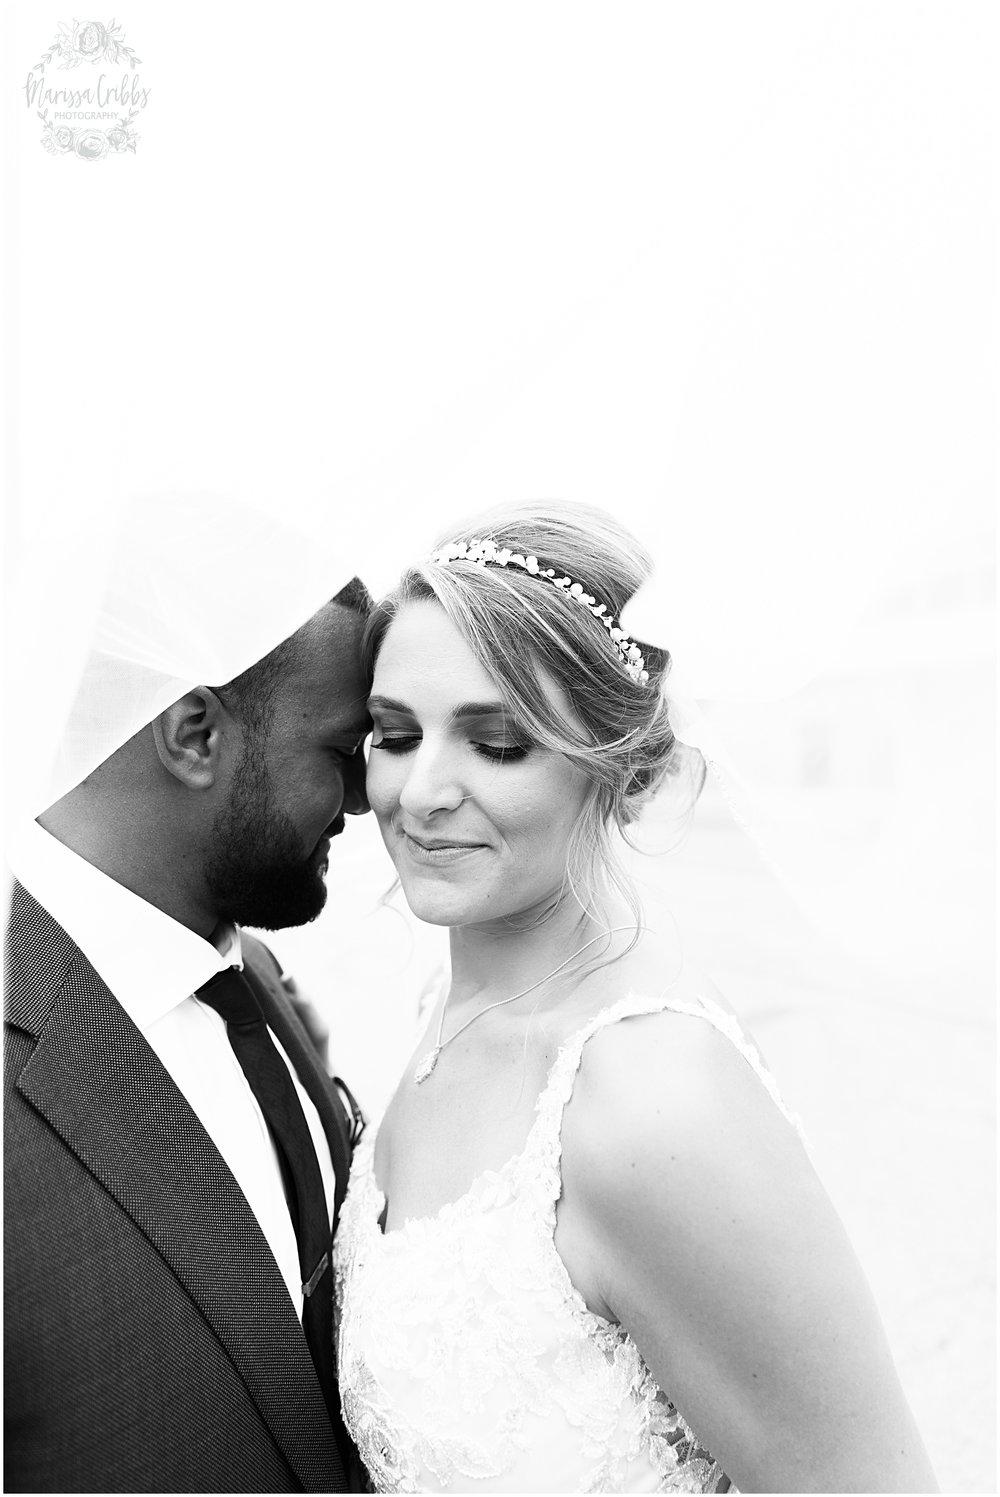 BAUER WEDDING | KELSEA & JUSTIN | MARISSA CRIBBS PHOTOGRAPHY_6545.jpg